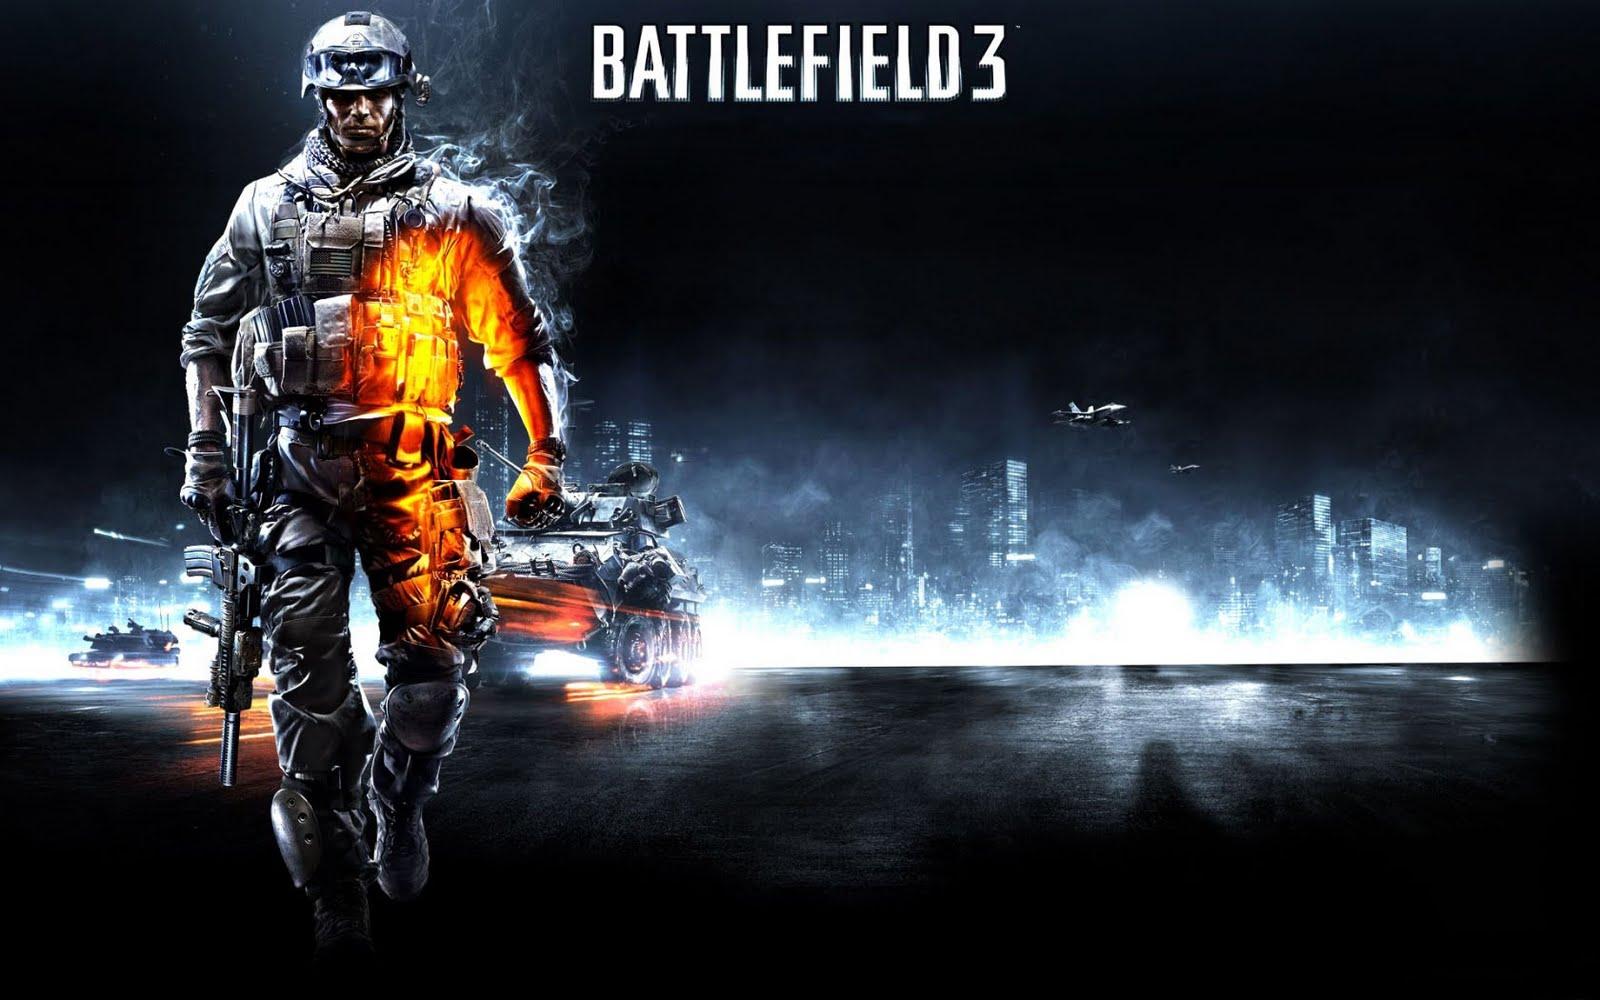 http://1.bp.blogspot.com/-OEkuBJGlf5s/TWunTTc6dlI/AAAAAAAADE4/Q8iwyncfkMI/s1600/battlefield_3.jpg